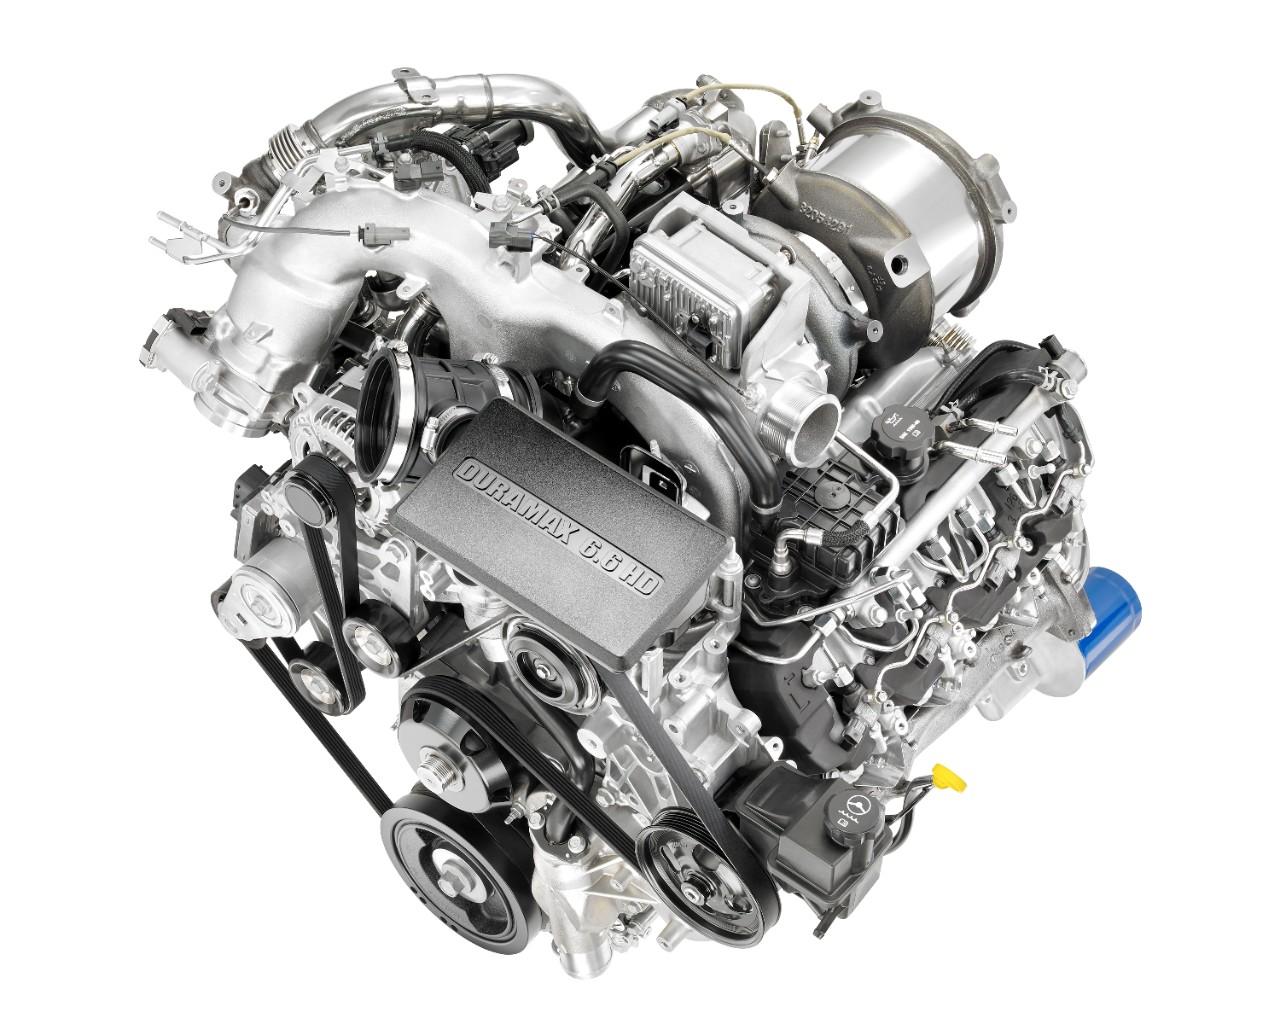 New Duramax Engine Headed For 2017 Silverado and Sierra HD Trucks